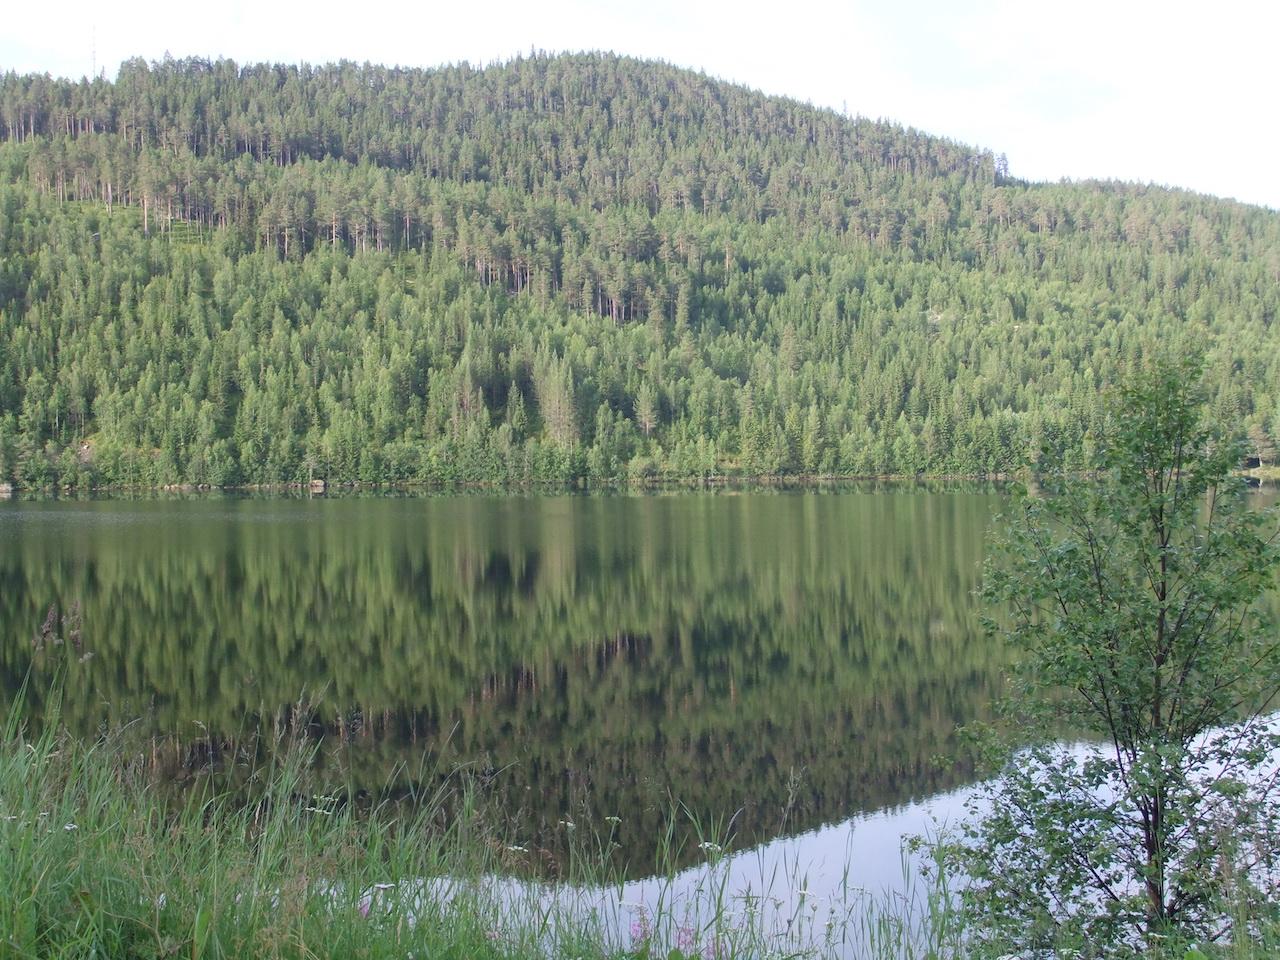 27 juli  2012 Beitostolen – Oslo – 59° 54'N 10° 45'E